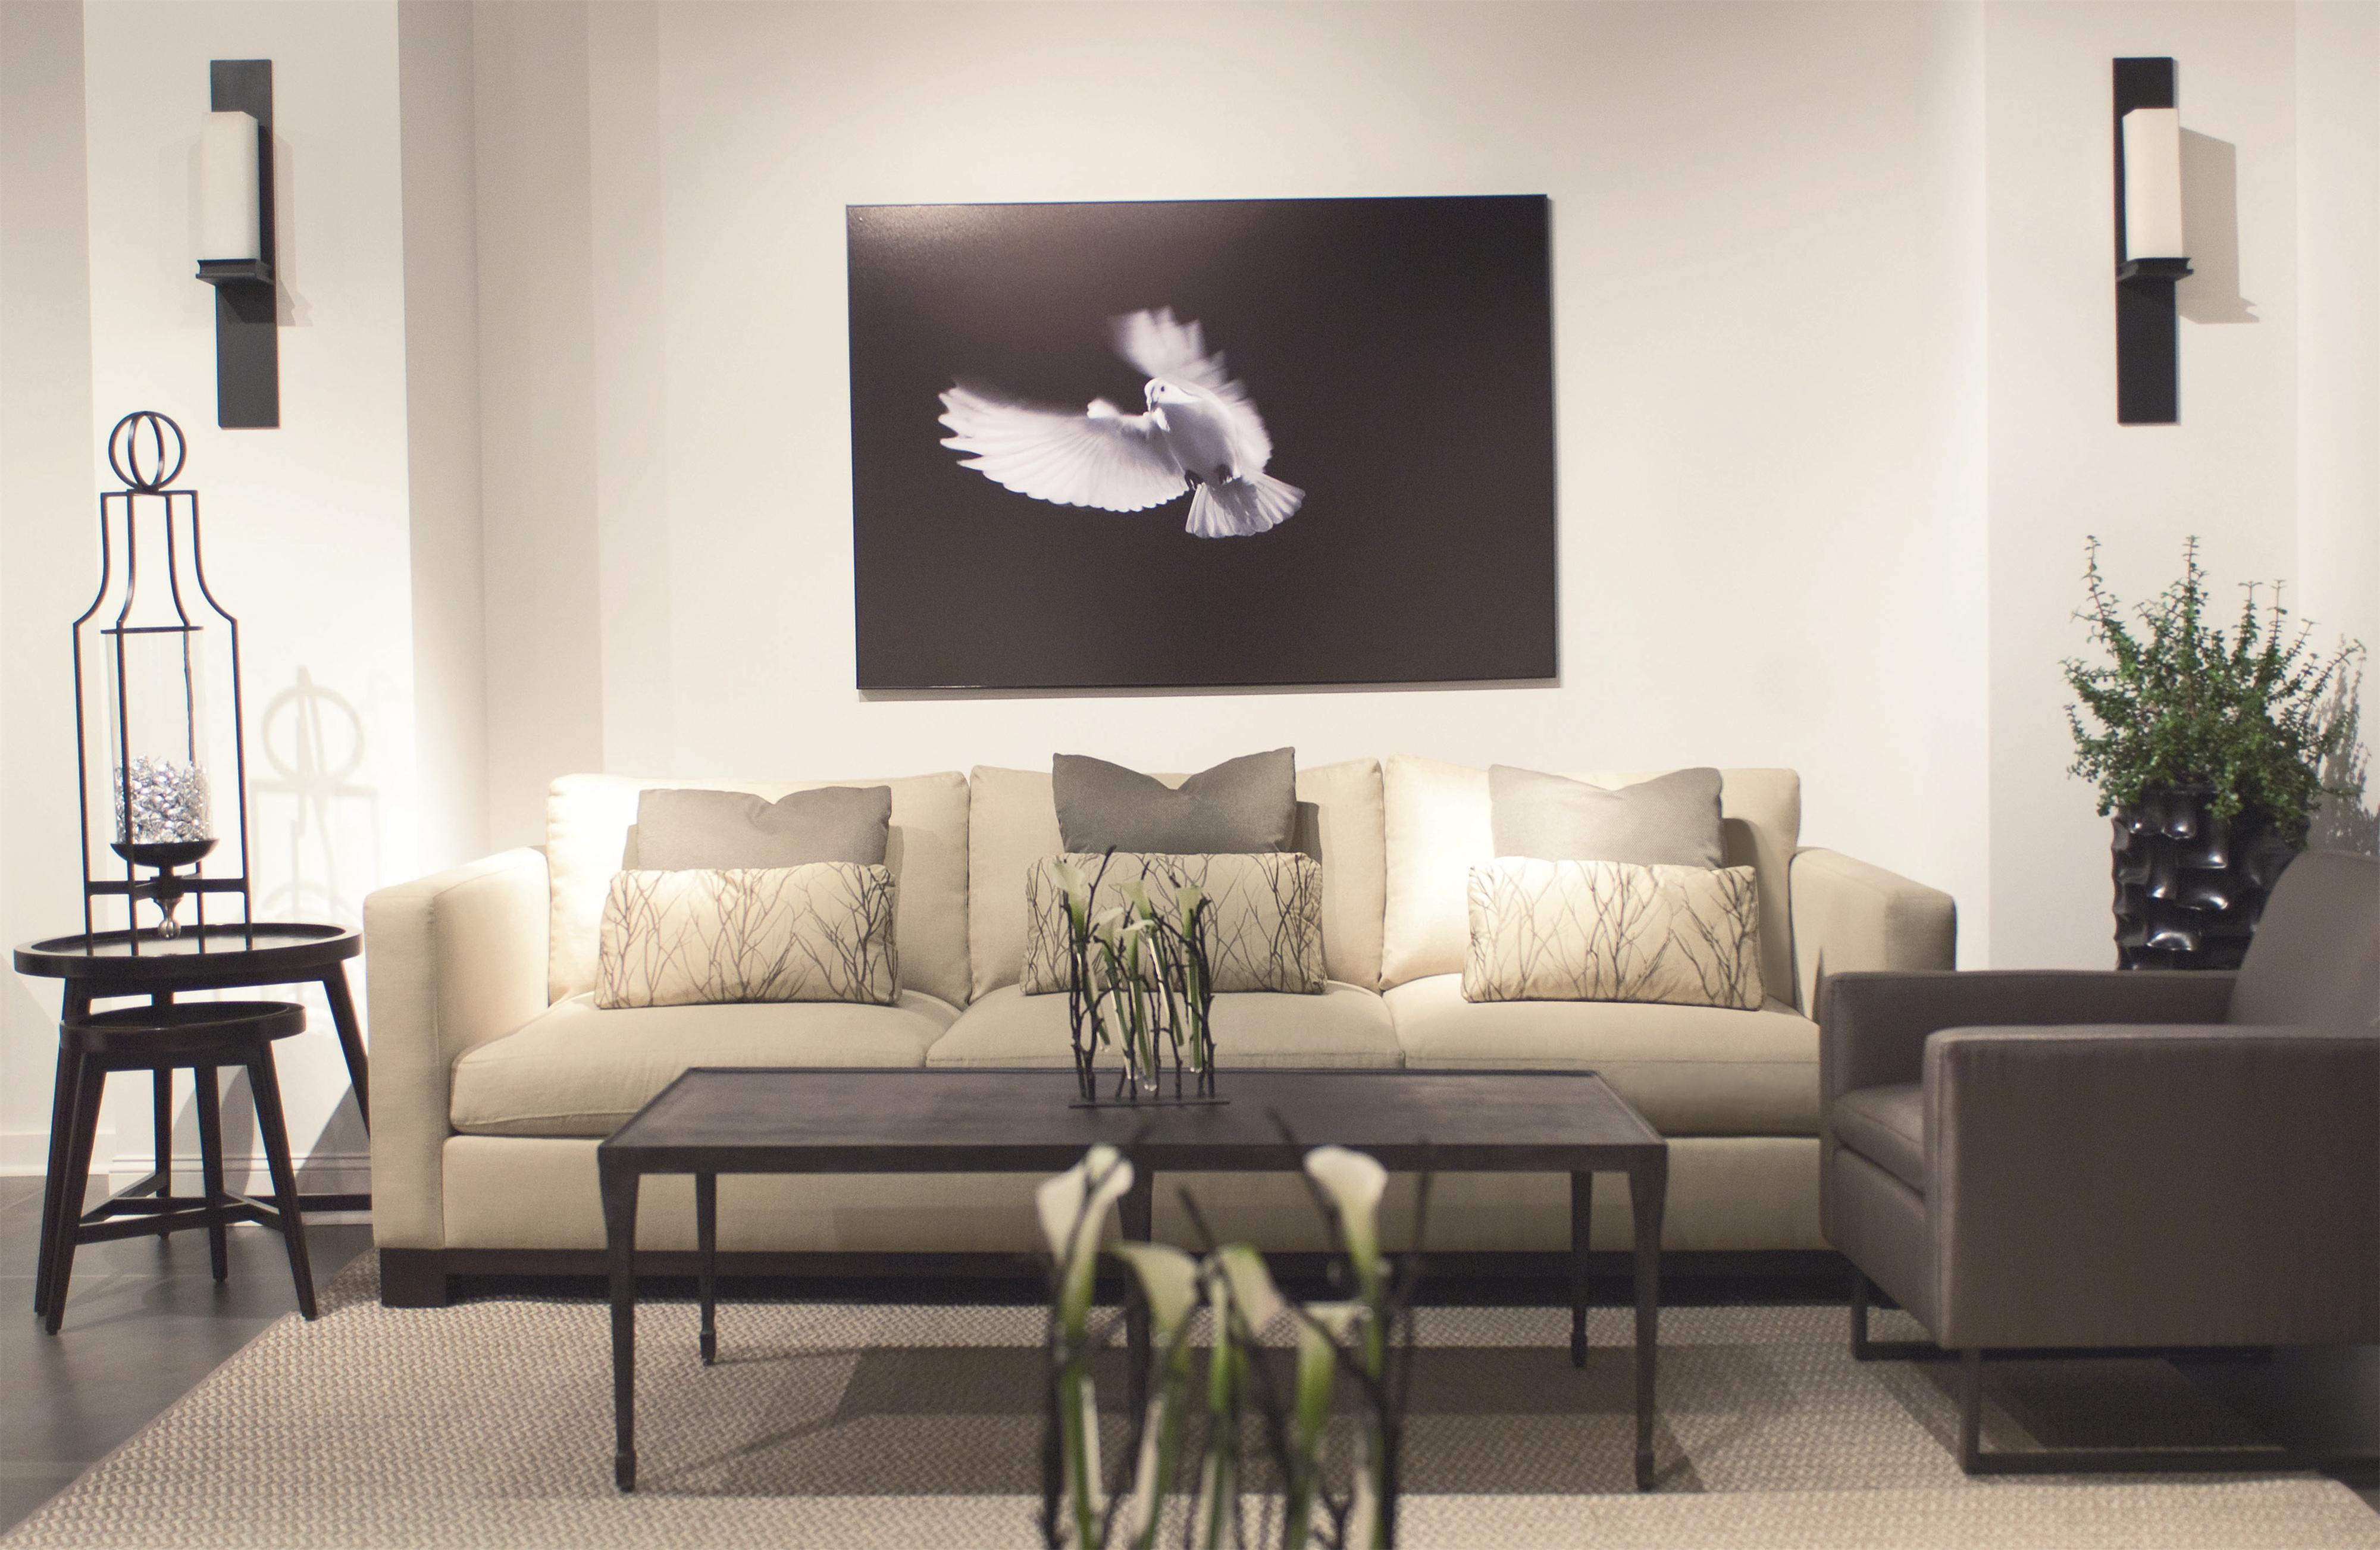 Bernhardt Lanai Modern Styled Sofa With Slight Asian Influence In Standard Sofa Size Belfort